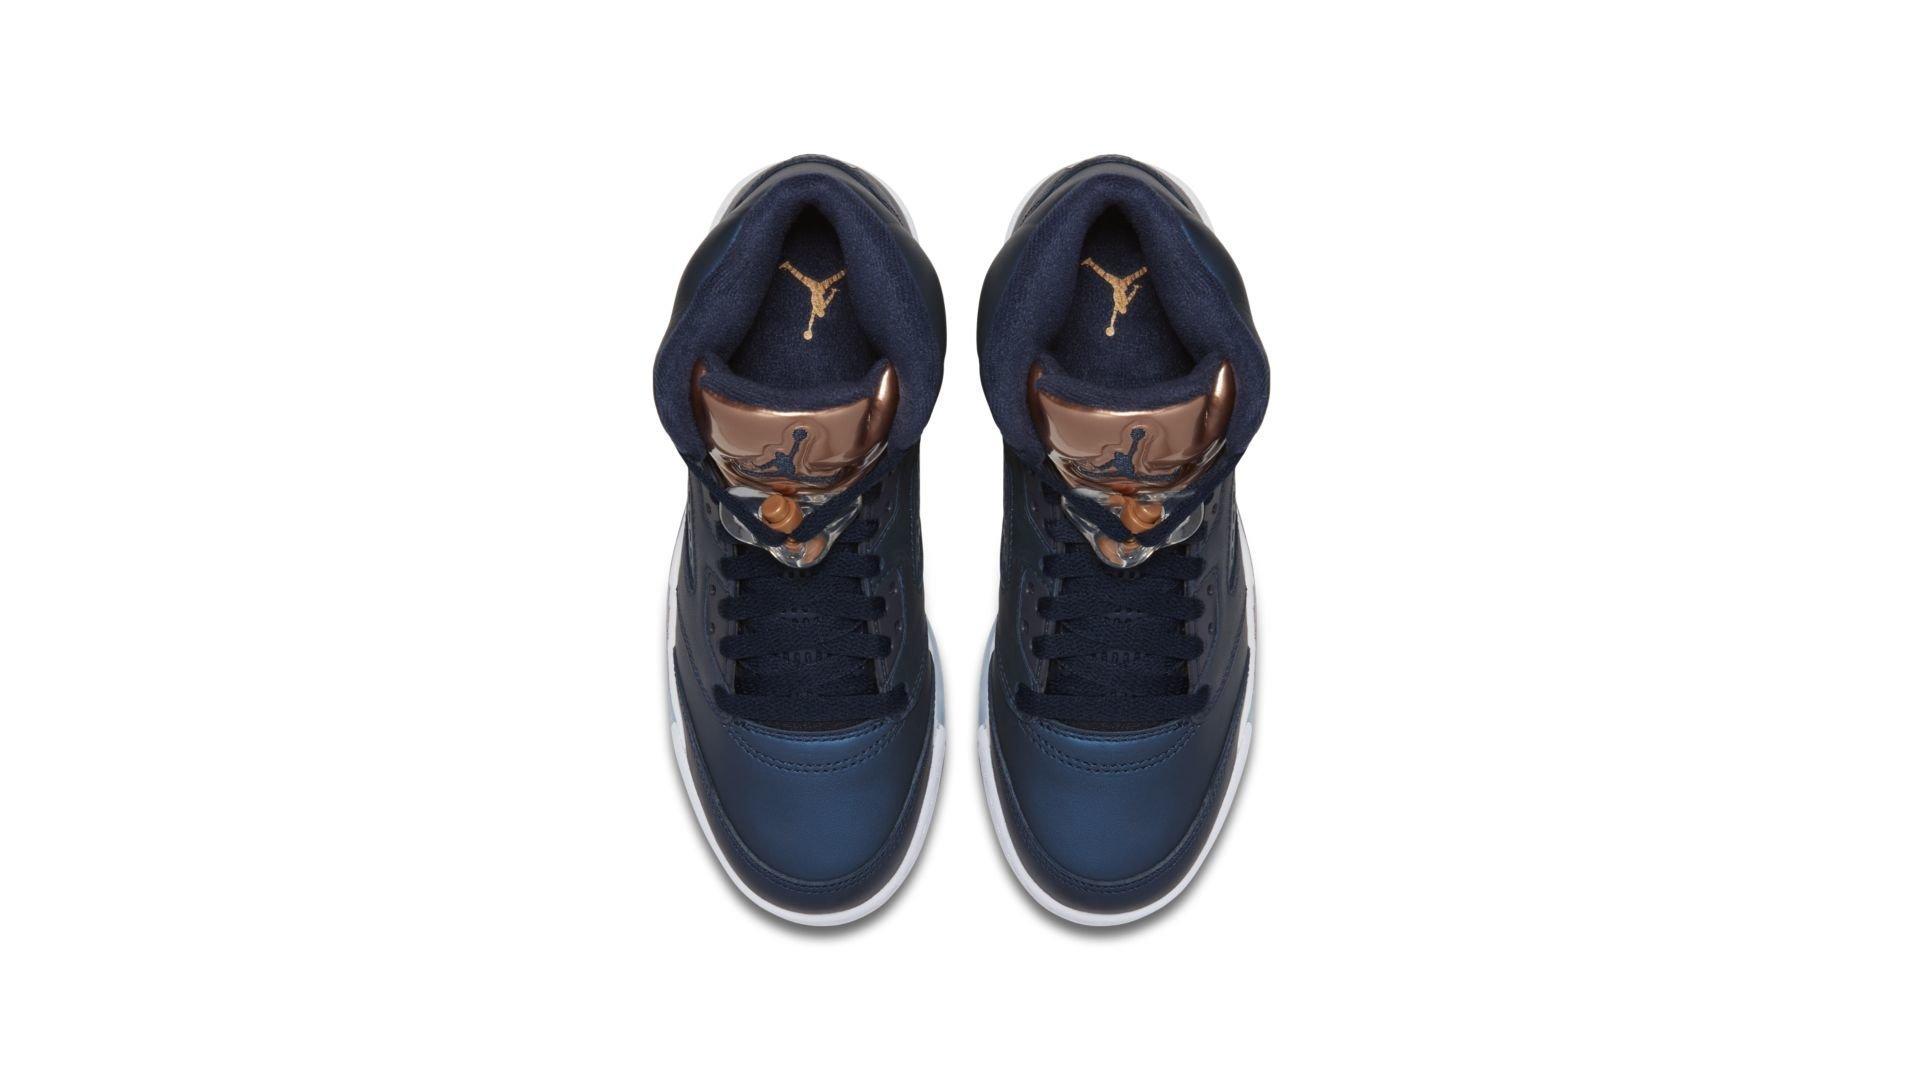 Jordan 5 Retro Bronze (GS) (440888-416)